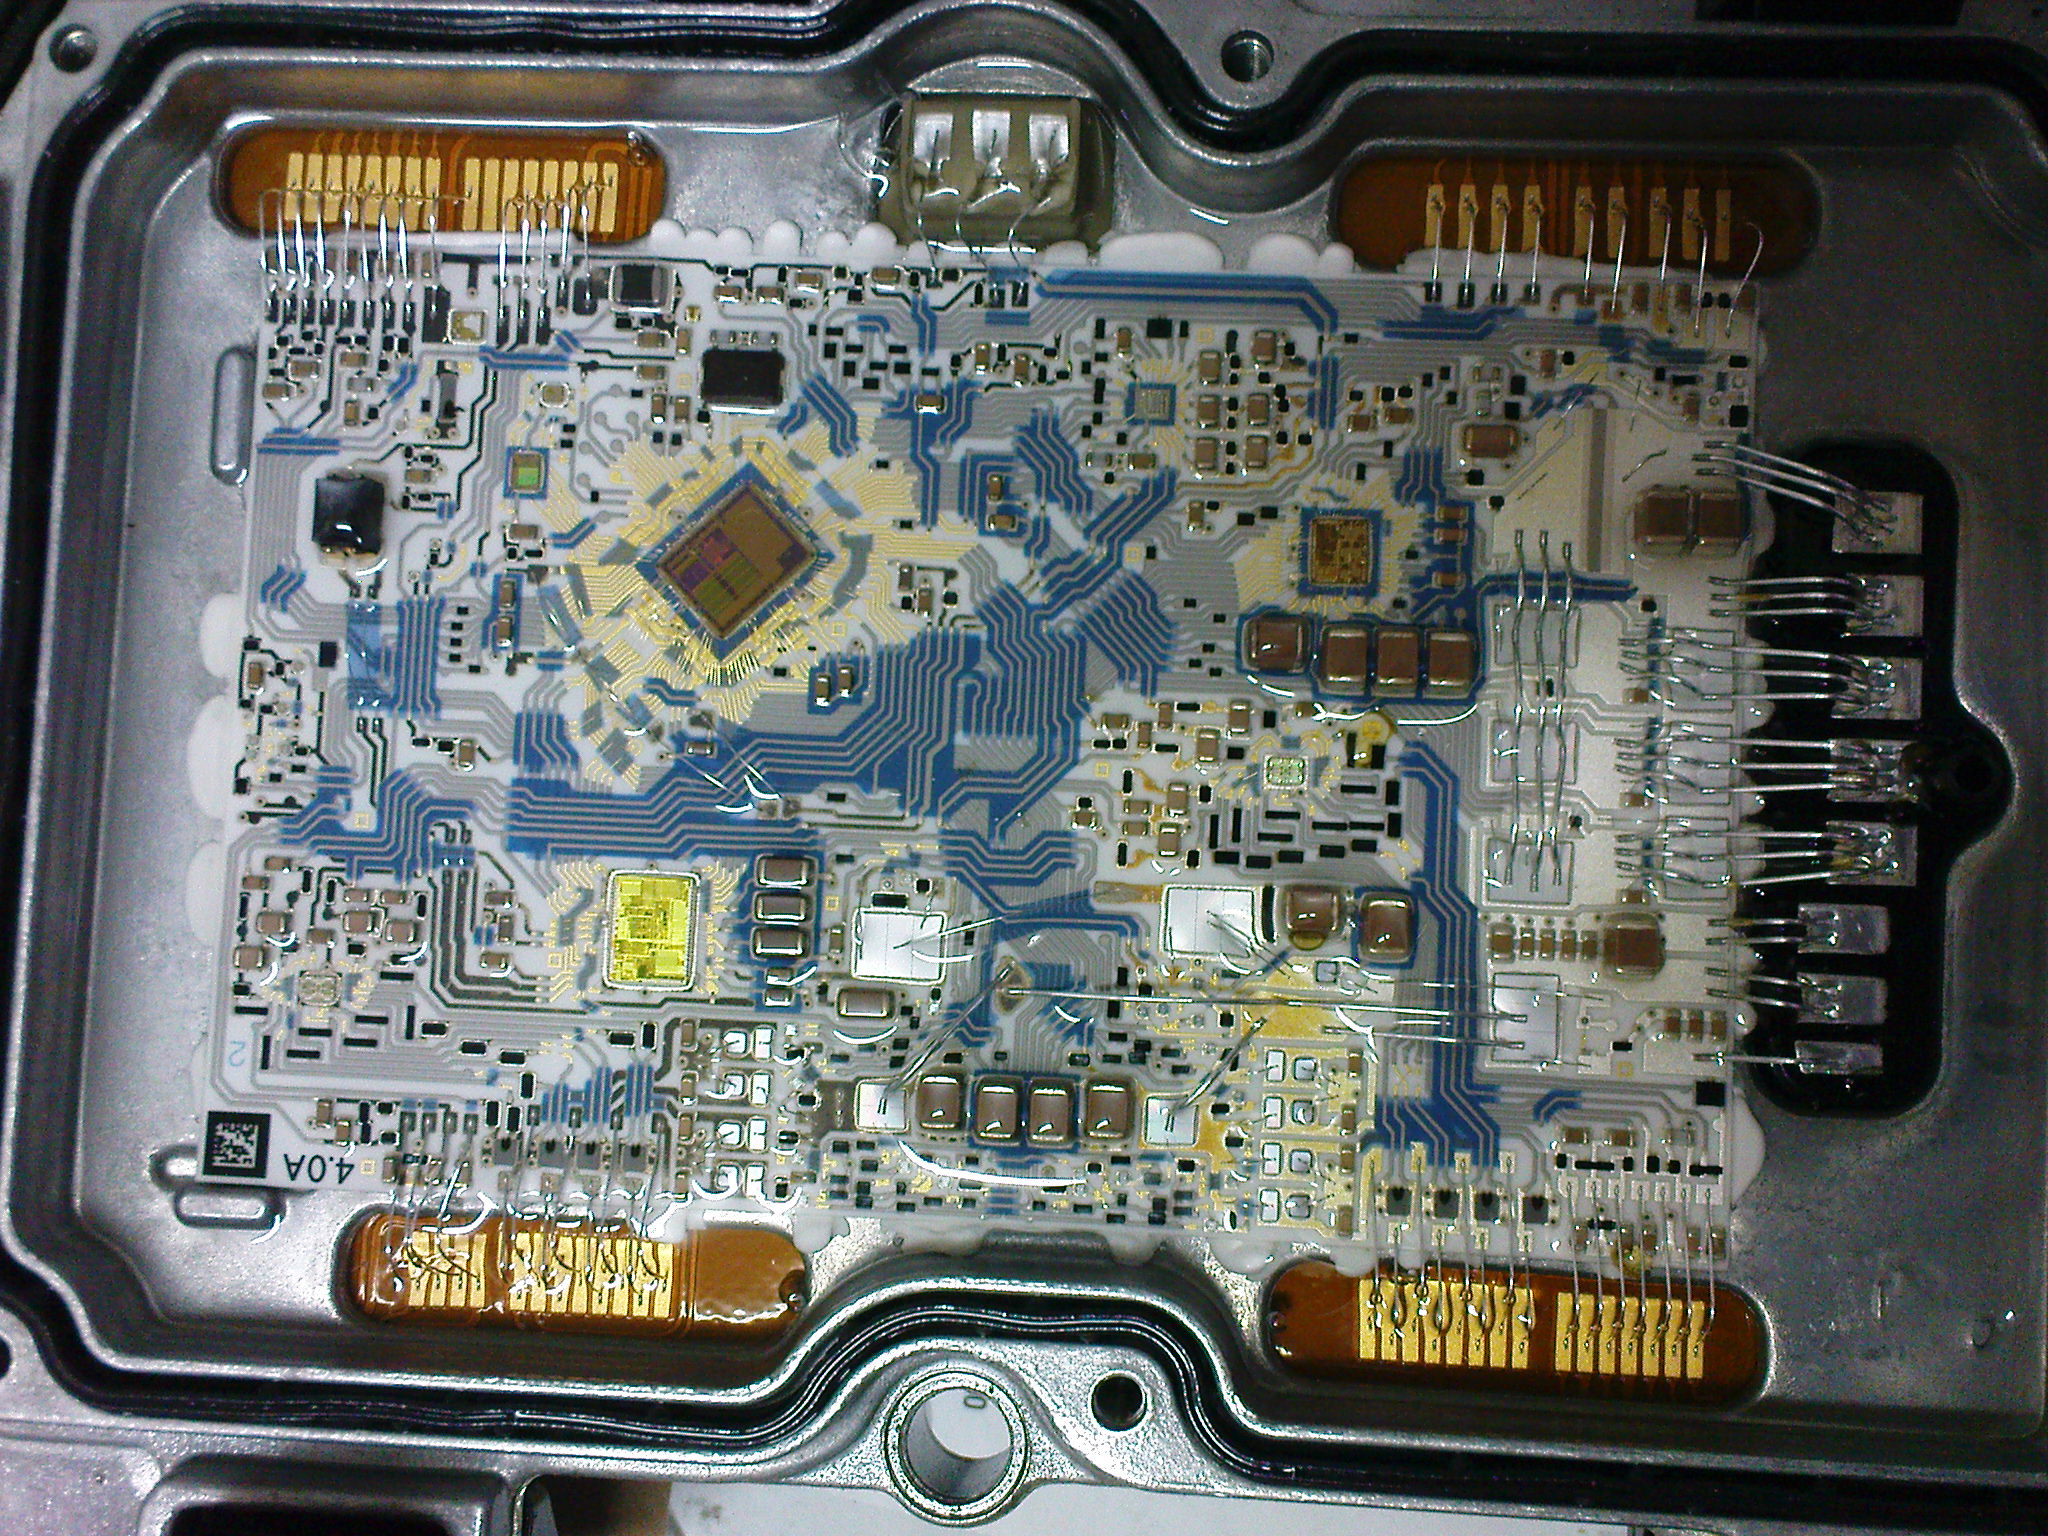 Vw Audi Dsg S Tronic Gerİ 199 AĞirma Recall For Dsg